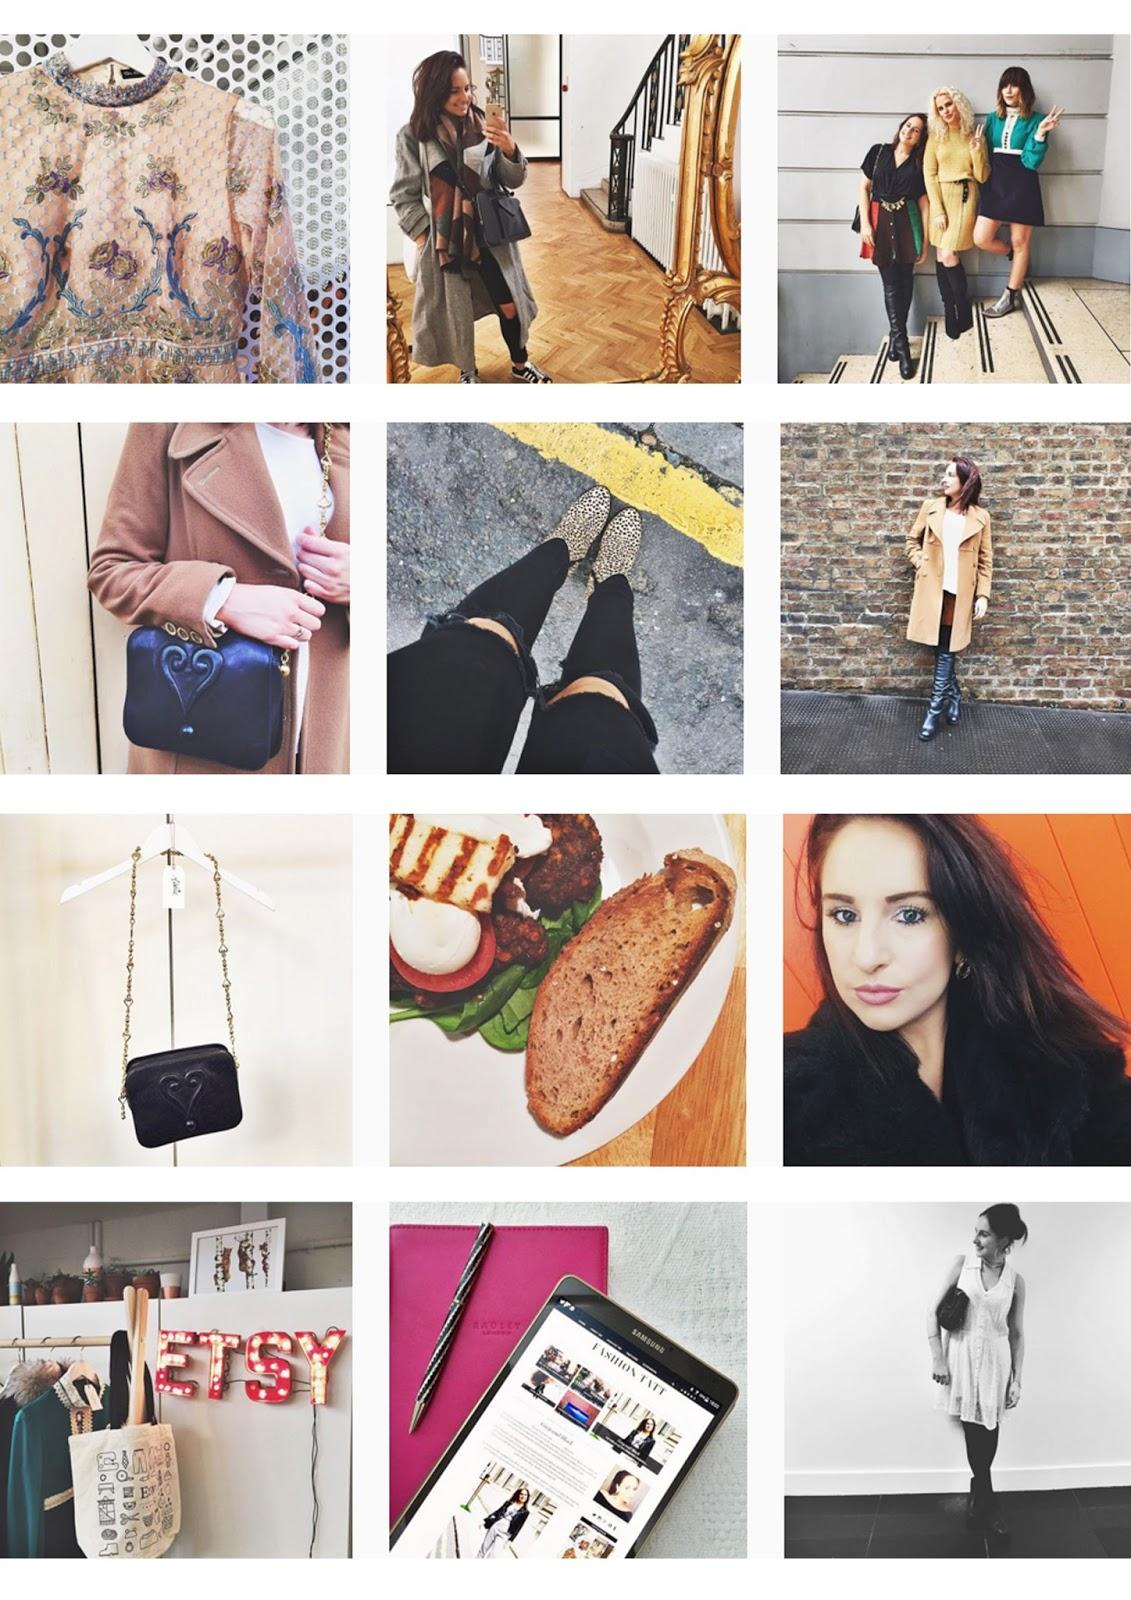 fashion tatt instagram